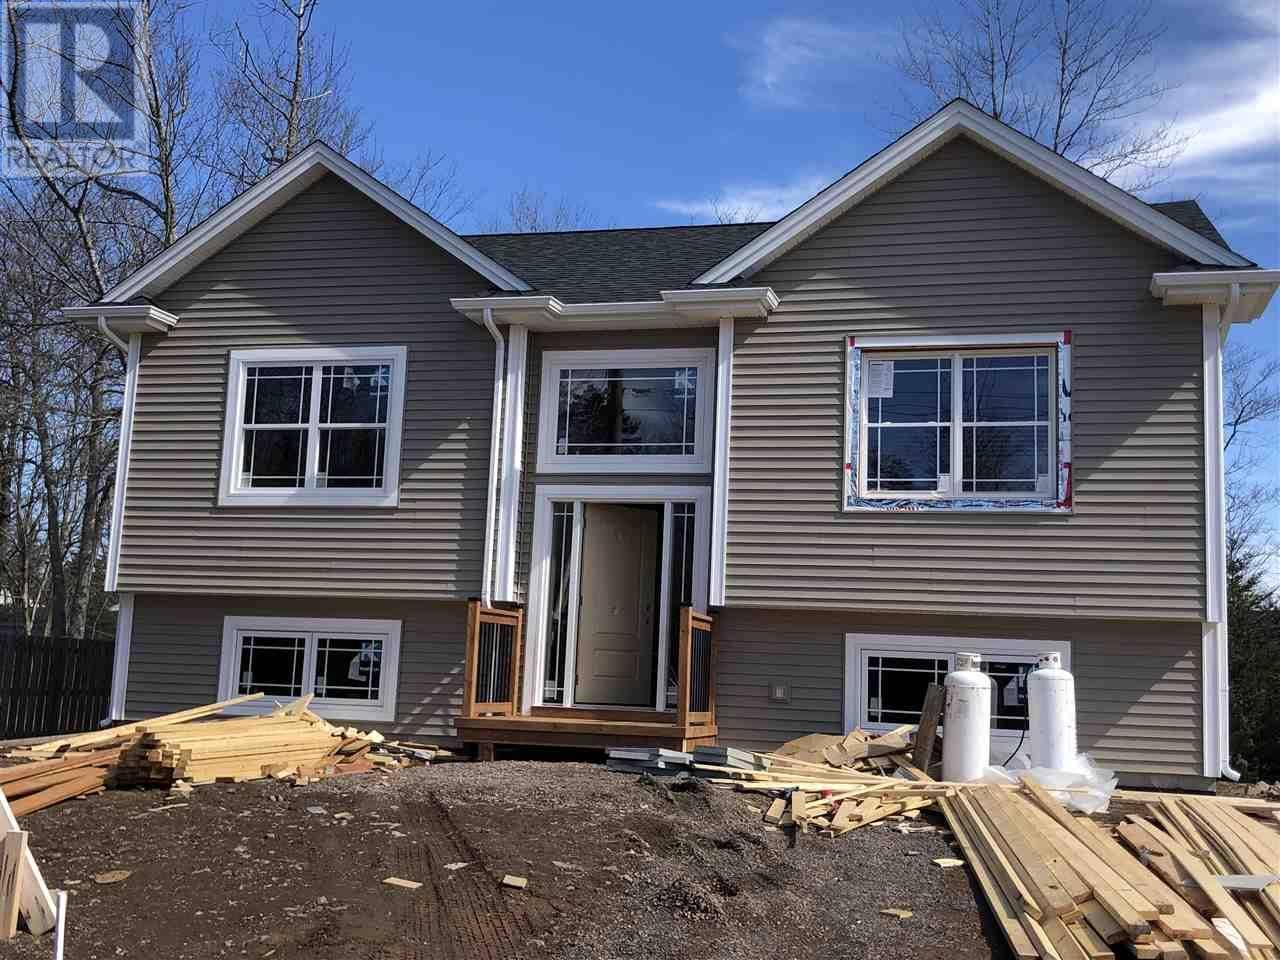 House for sale at 1 Delaney Dr Valley Nova Scotia - MLS: 201922467